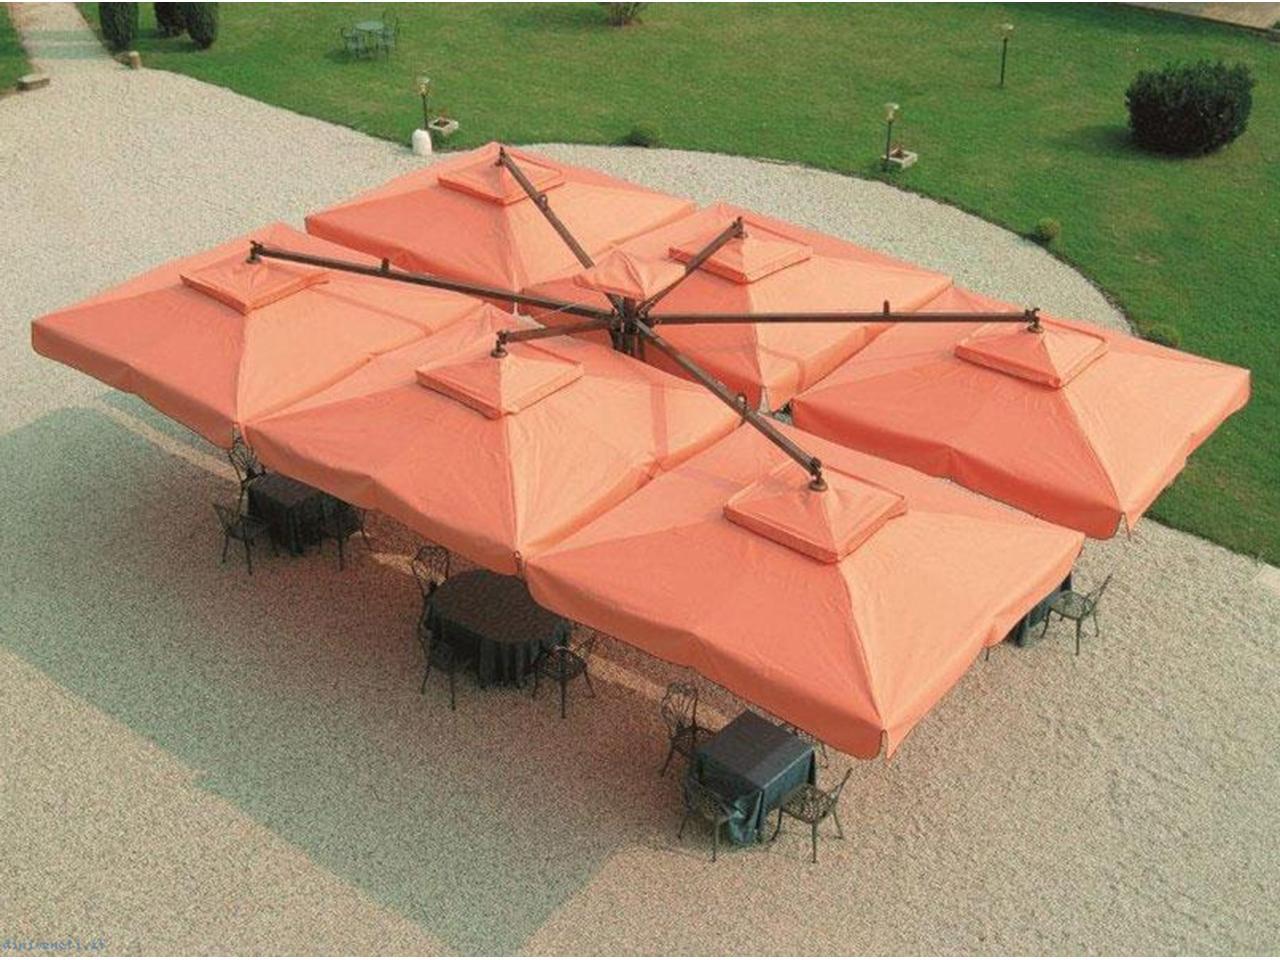 Надежные зонты для кафе